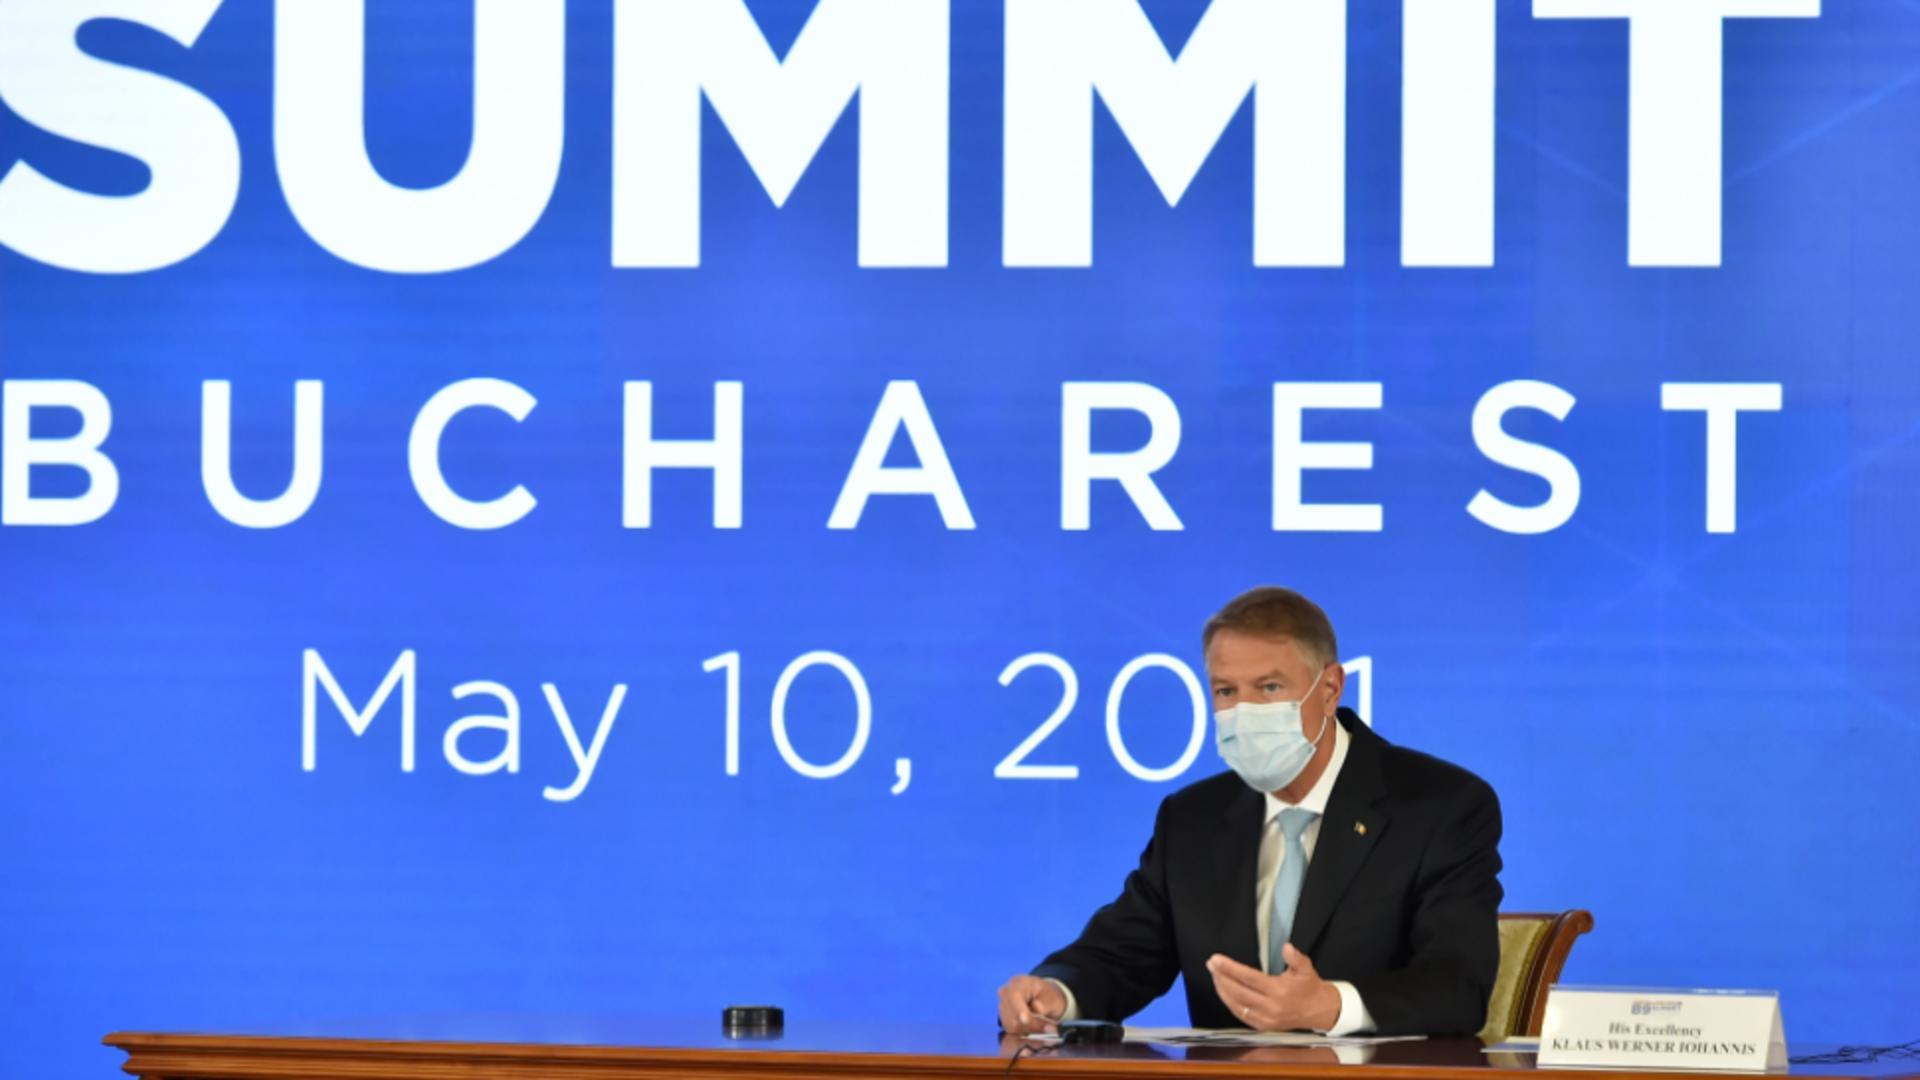 Summit NATO Bucuresti Foto: Administrația Prezidențială